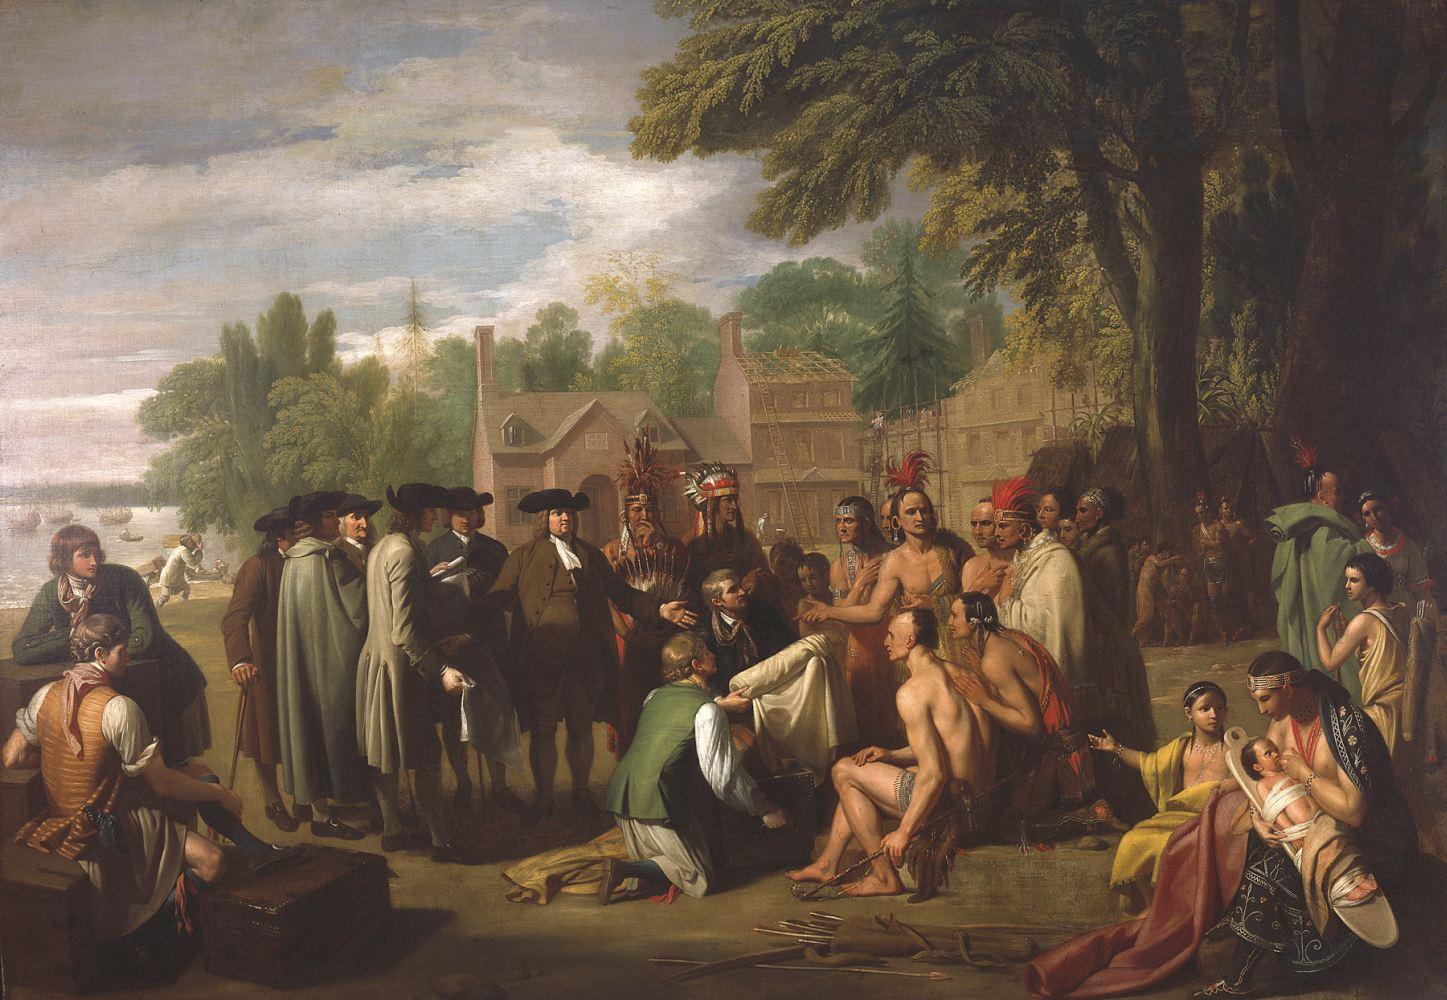 Договор Пенна с индейцами. Худ.Б. Уэст, 1878.